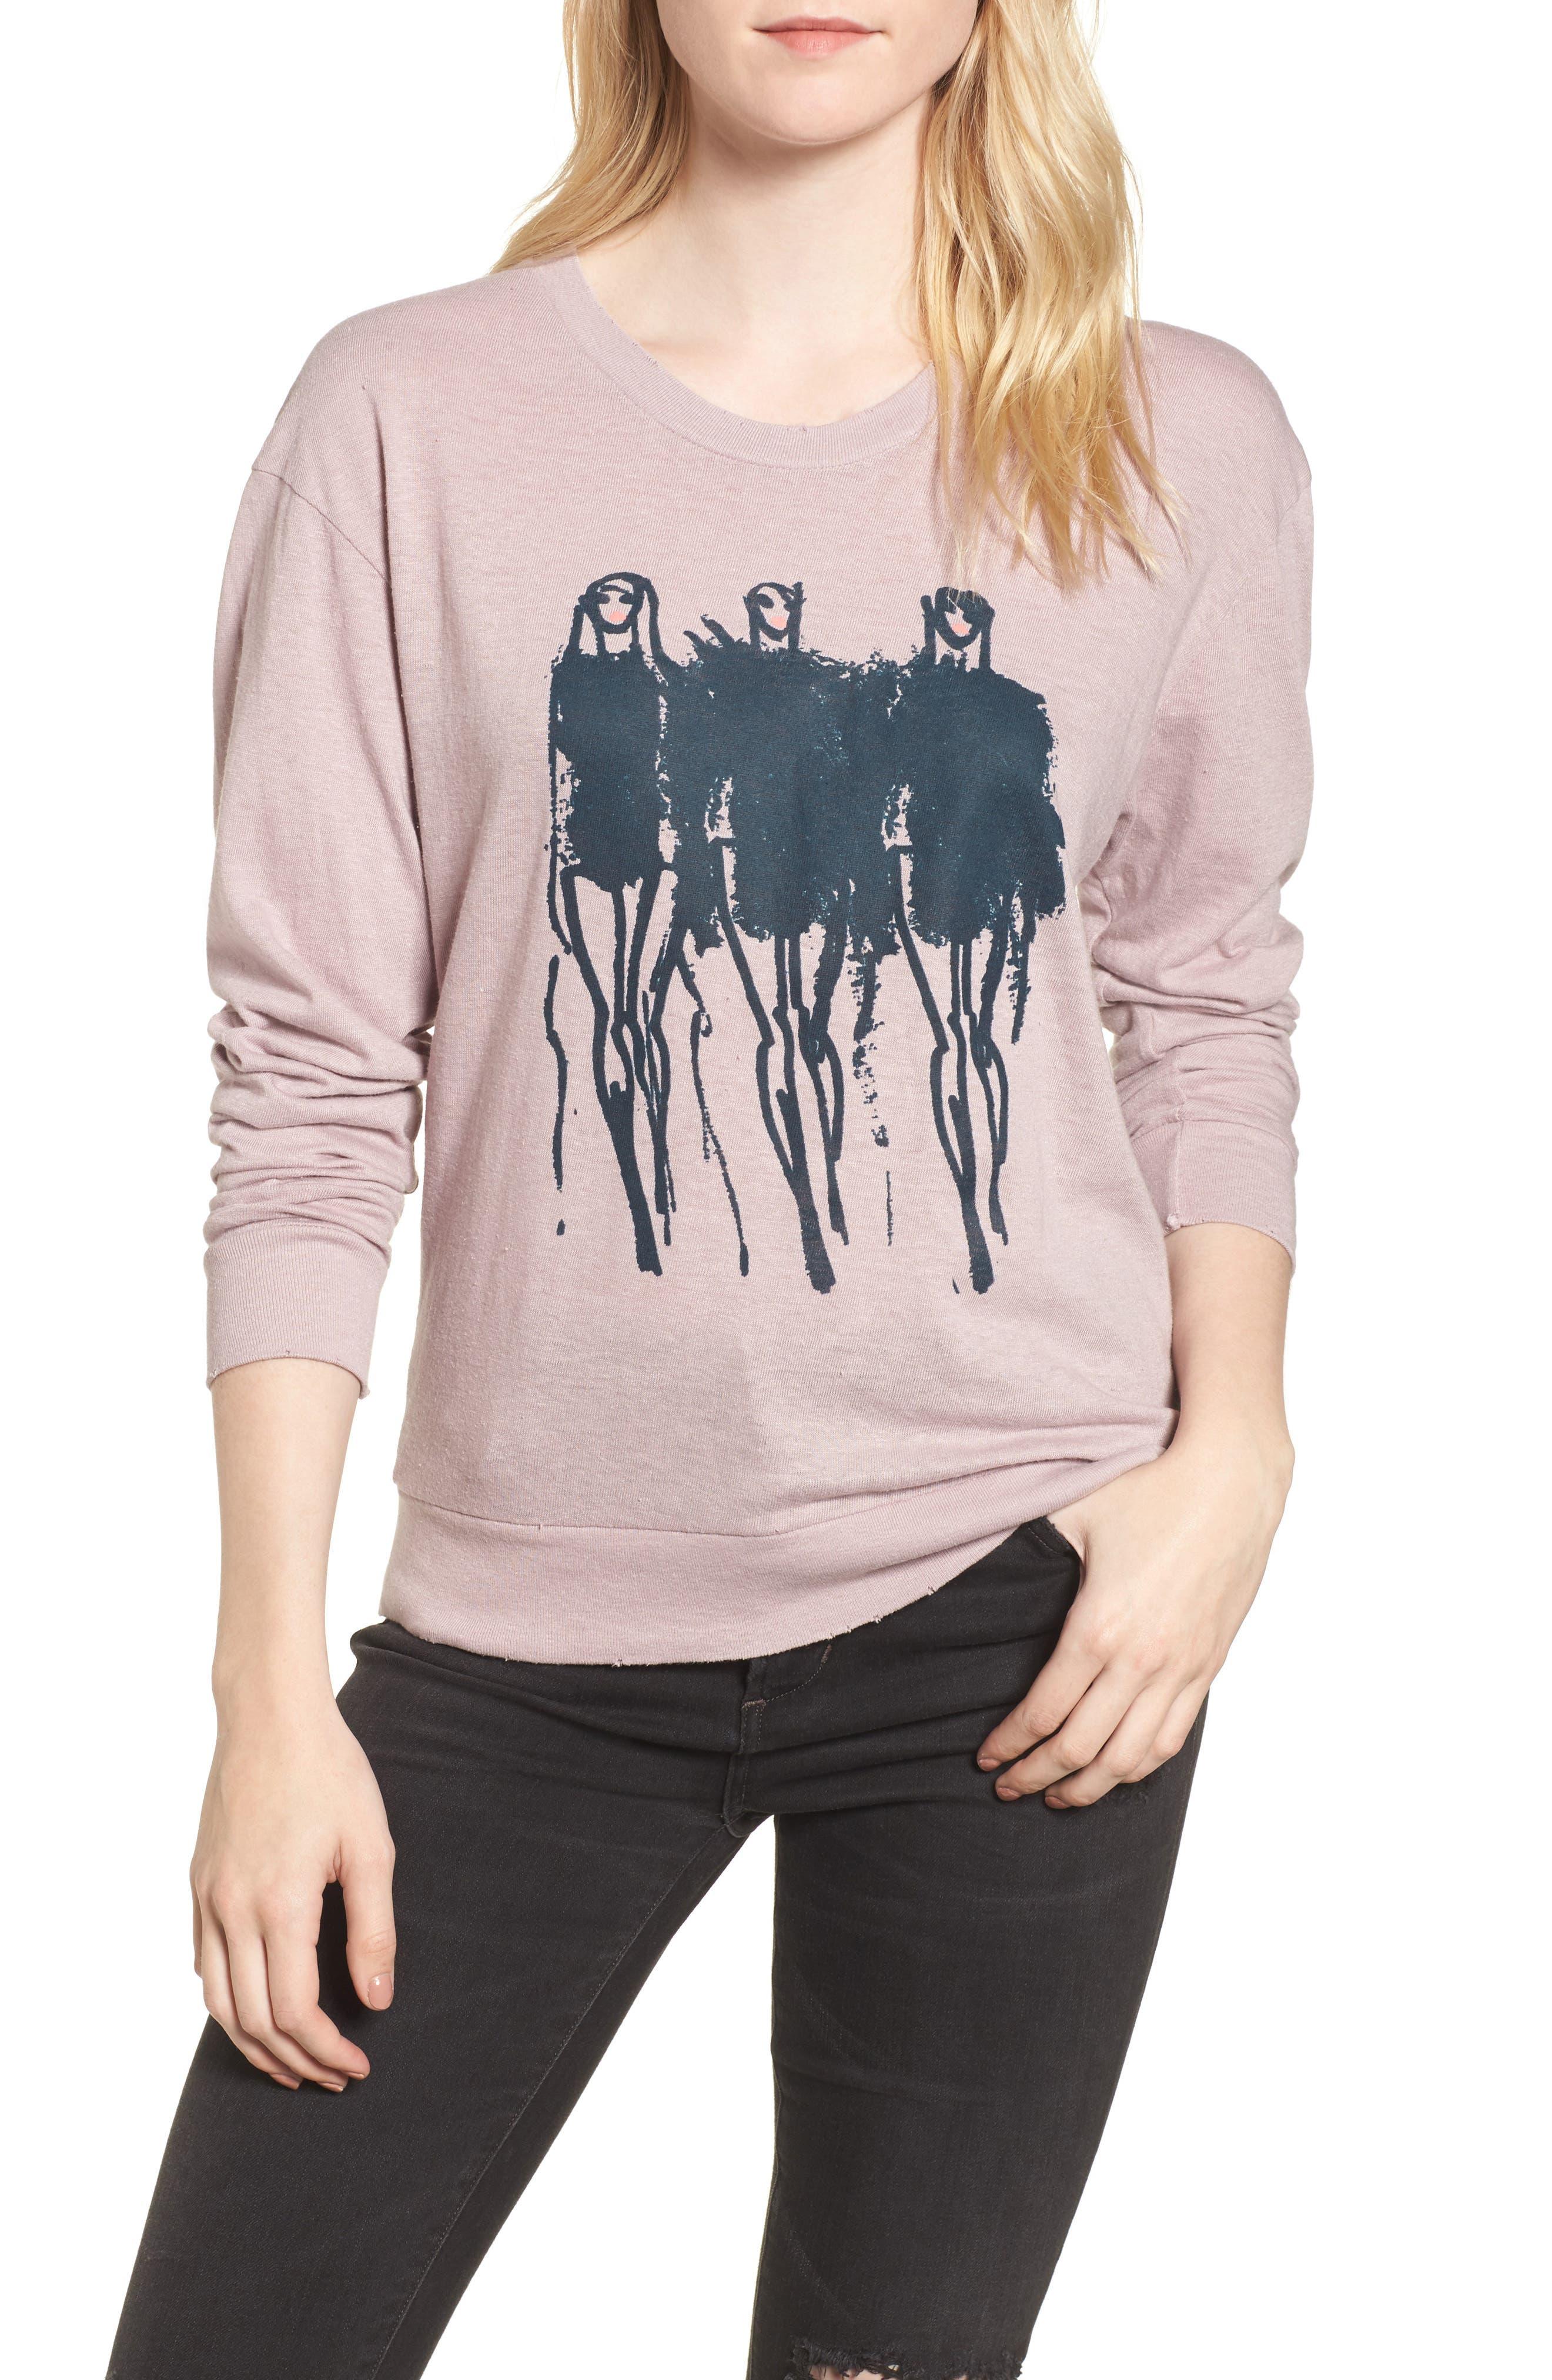 Main Image - Junk Food x Donald Robertson Black Dresses Sweatshirt